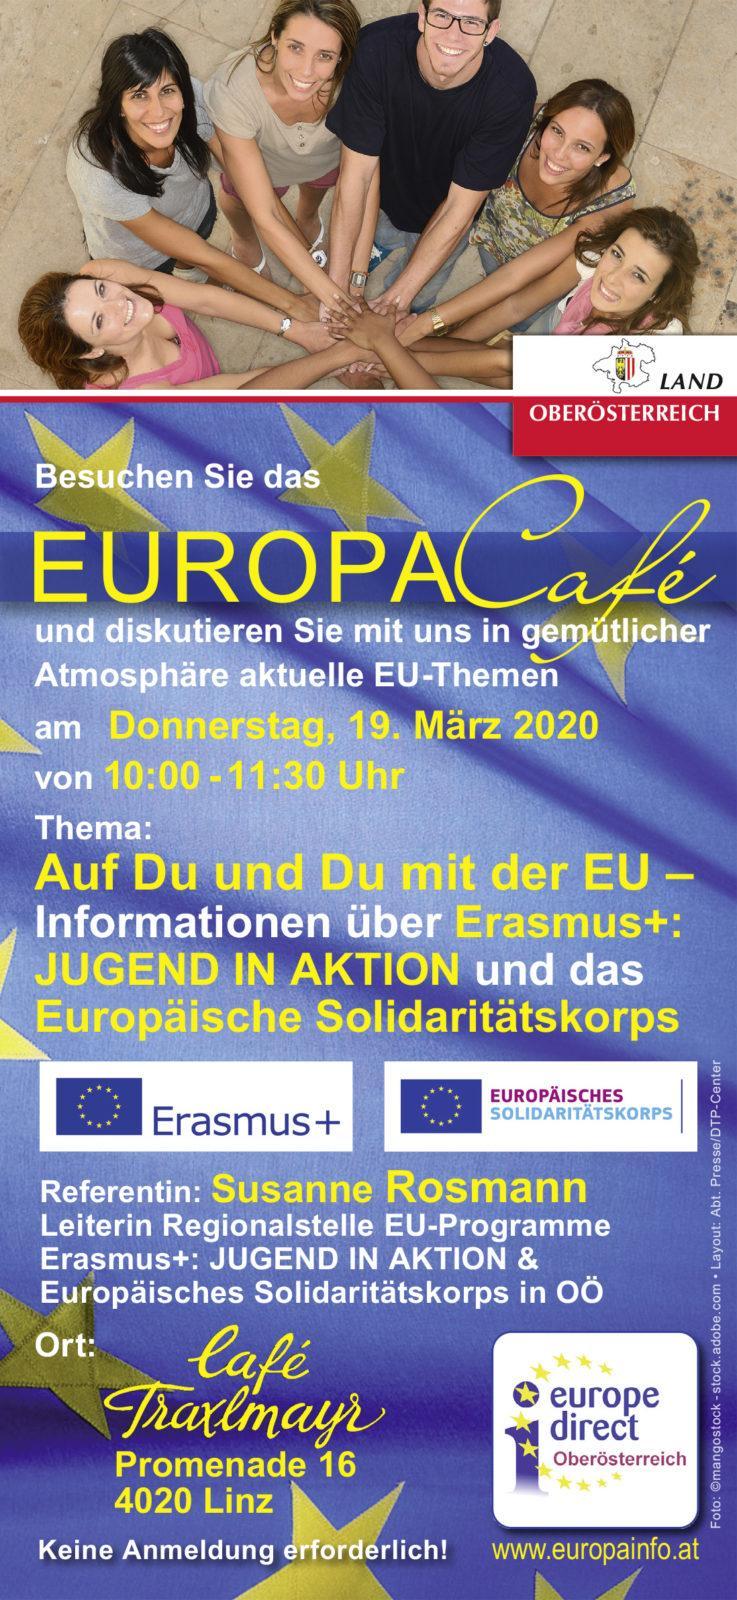 EuropaCafe am 19.3.2020